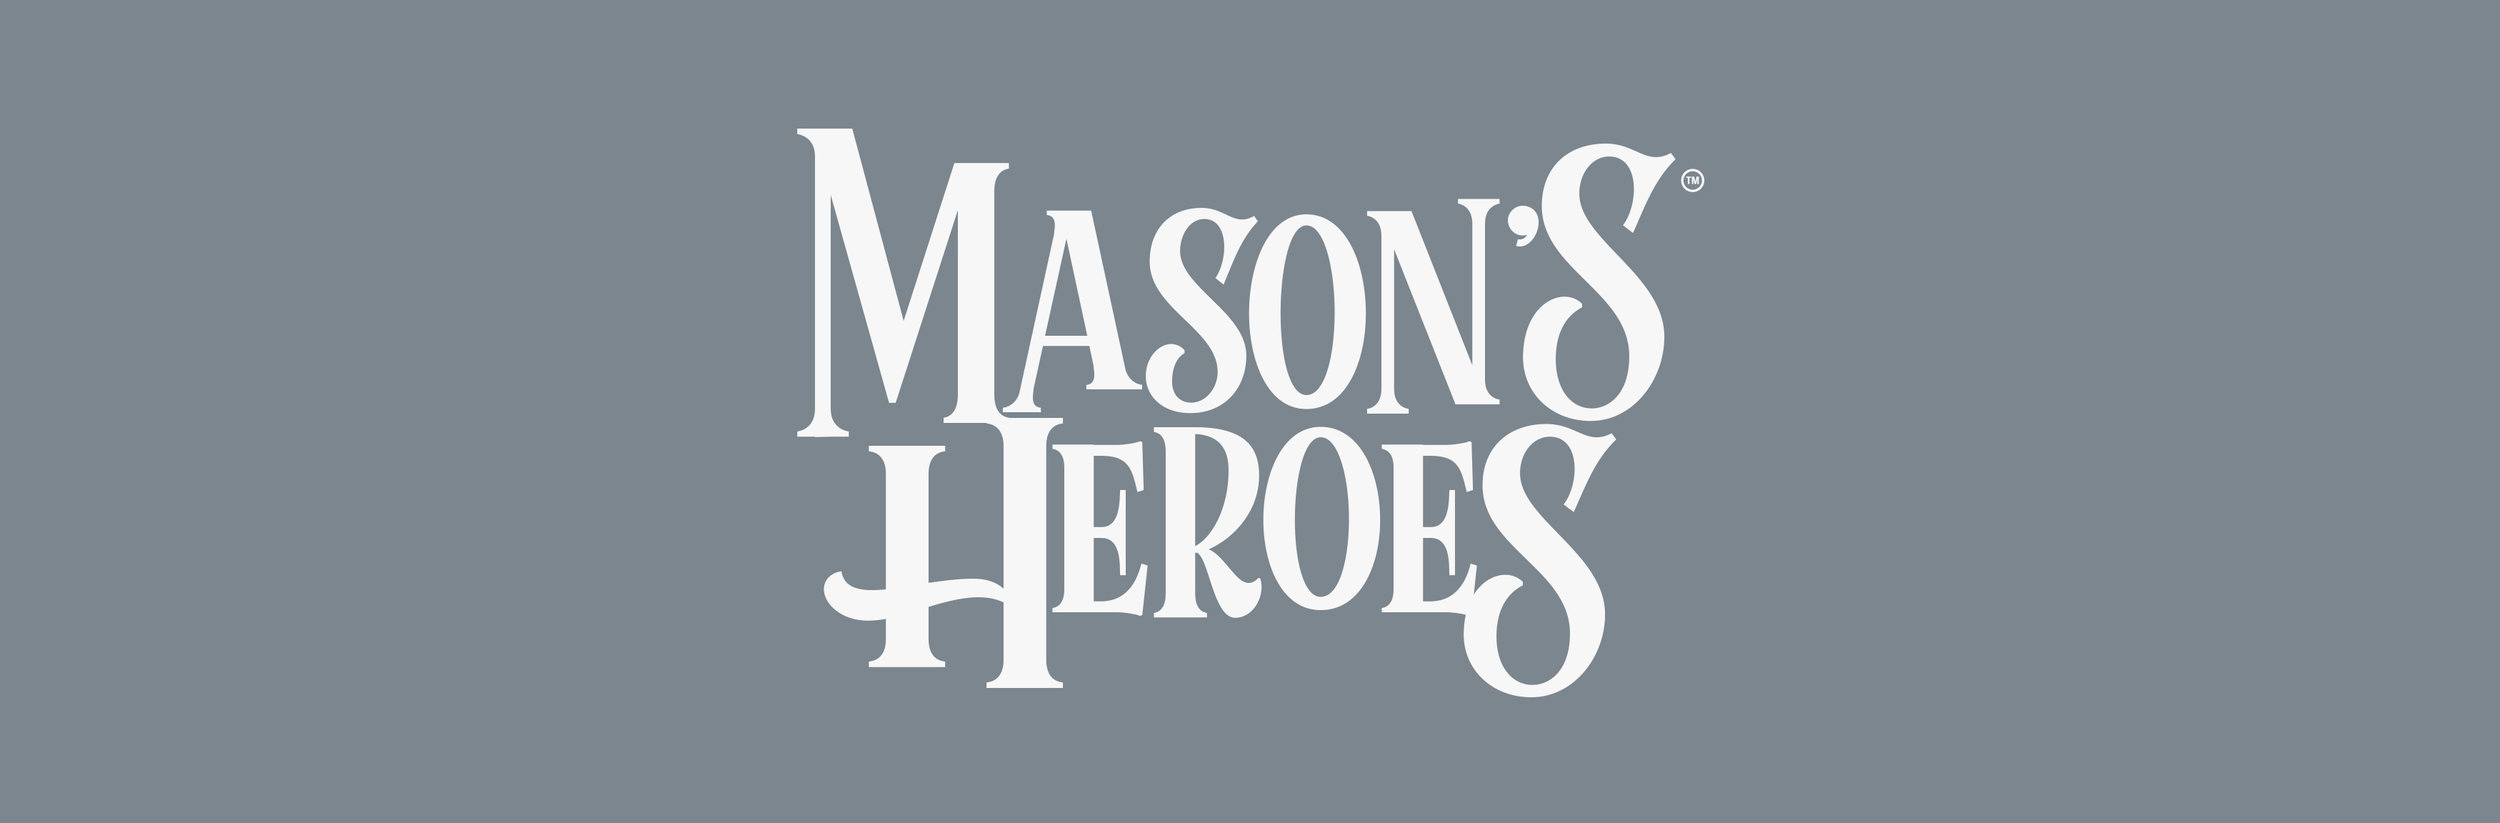 Mason'sHeroes-Logo-wide.jpg